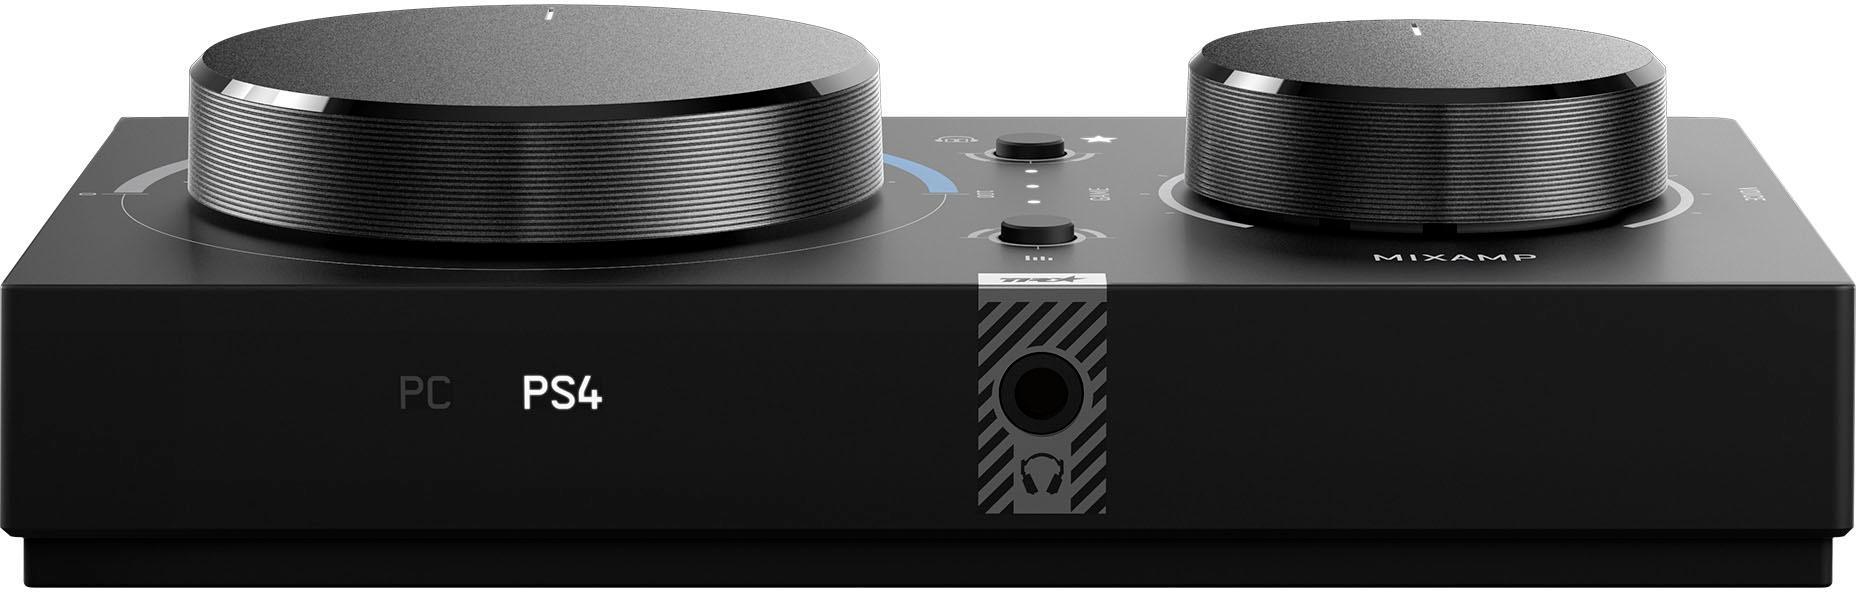 astro mixamp pro tr neu ps4 ps3 pc mac gaming headset kabelgebunden auf rechnung. Black Bedroom Furniture Sets. Home Design Ideas